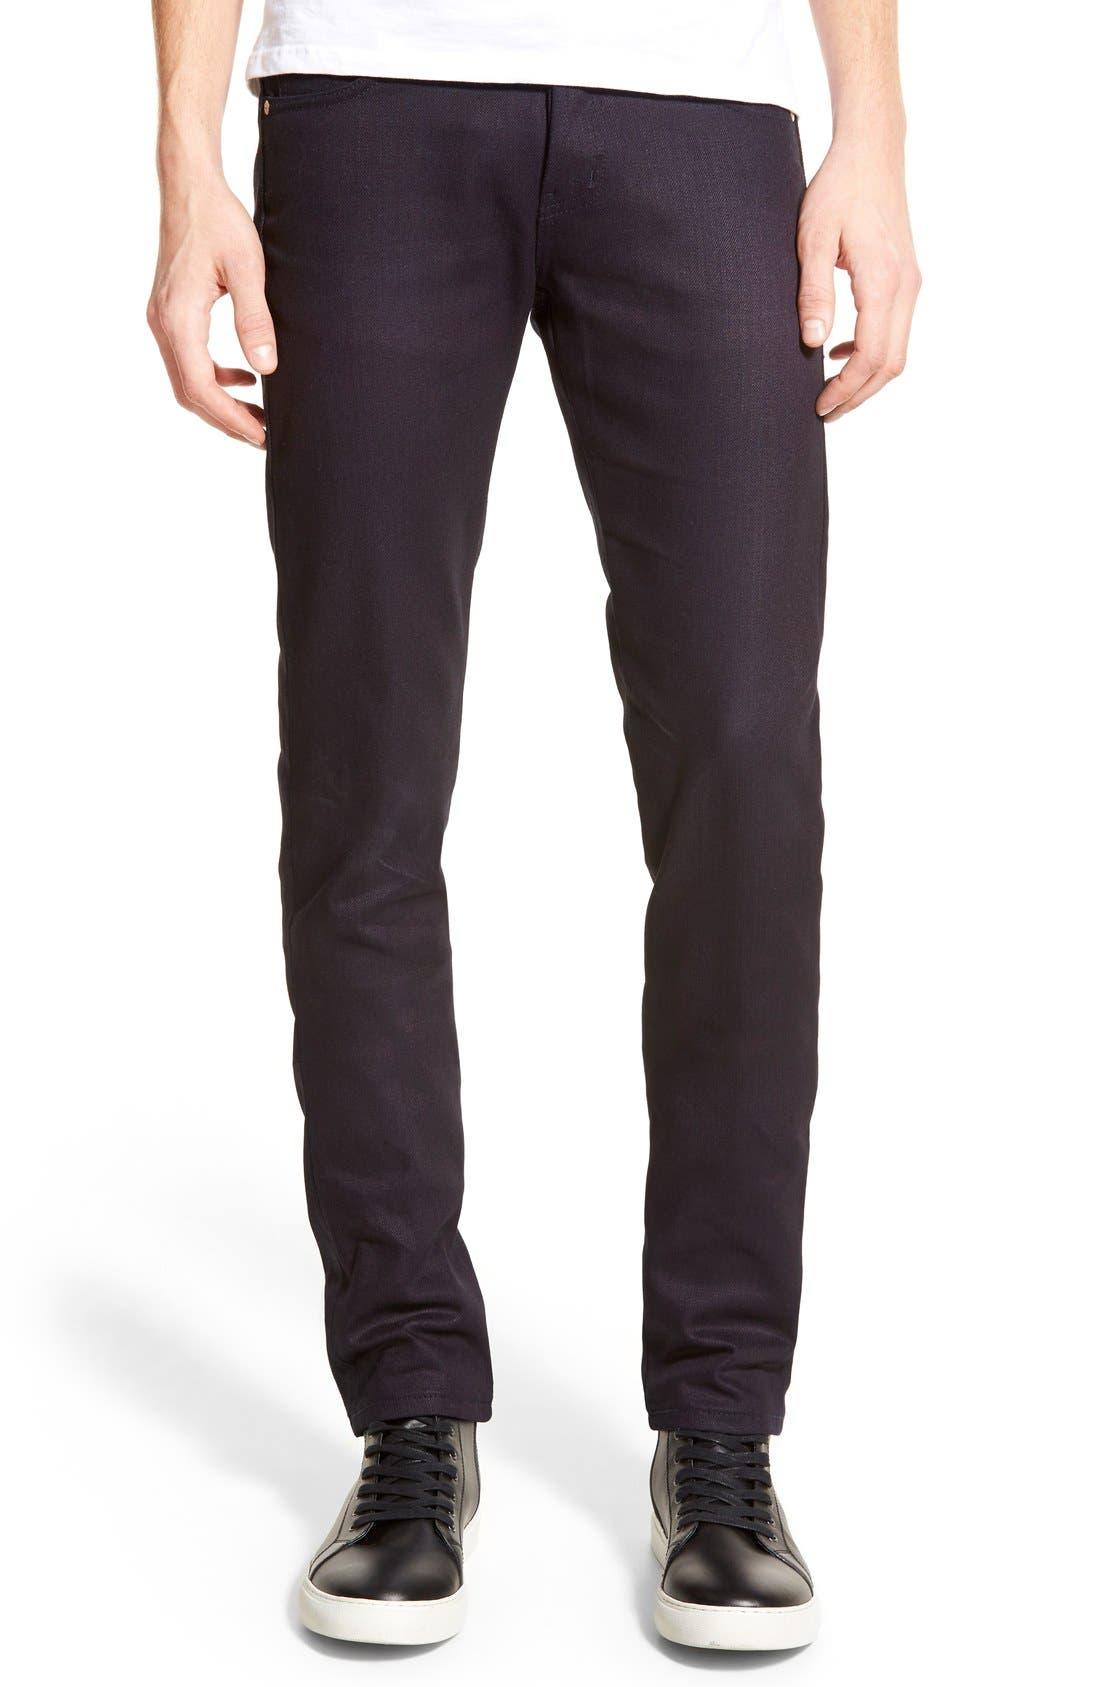 Super Skinny Guy Skinny Fit Jeans,                             Main thumbnail 1, color,                             INDIGO STRETCH SELVEDGE